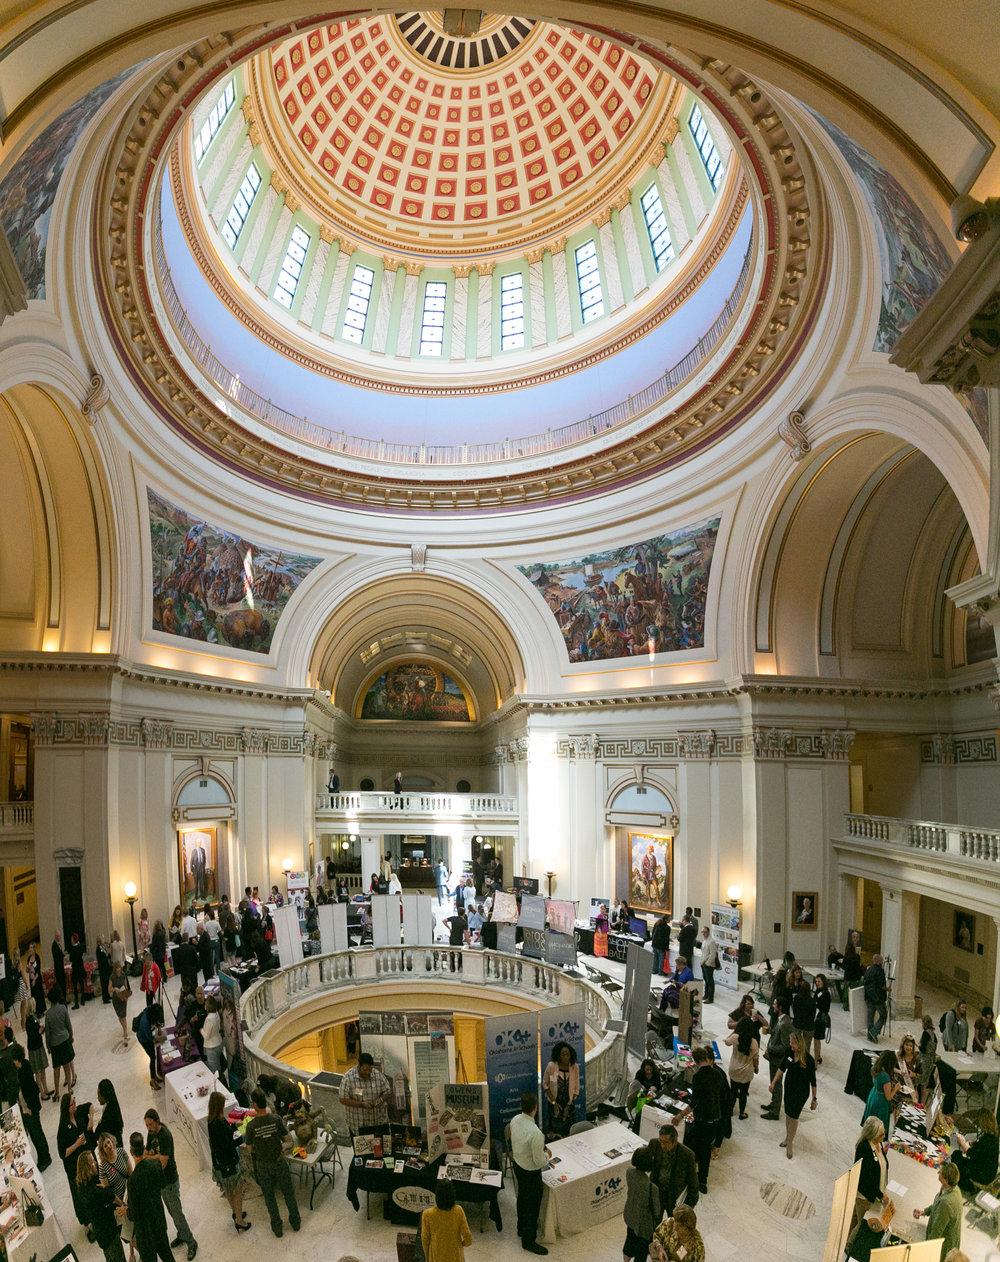 2nd Floor Rotunda of the OK Capitol Building, Arts Day 2016